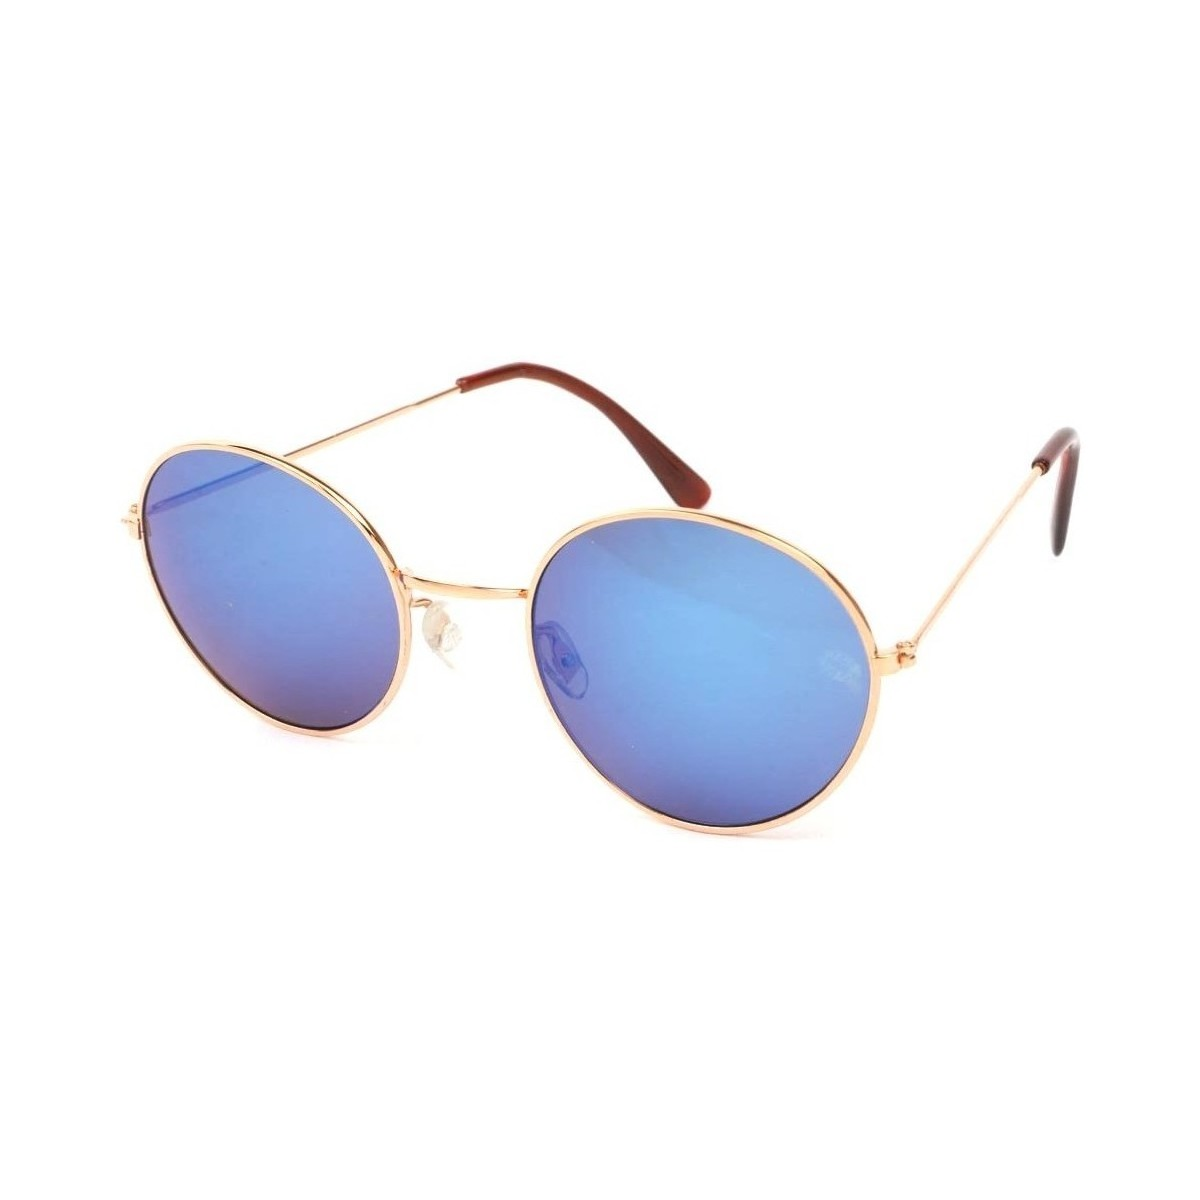 Eye Wear Lunettes Soleil John monture dorée verres reflets bleu Bleu